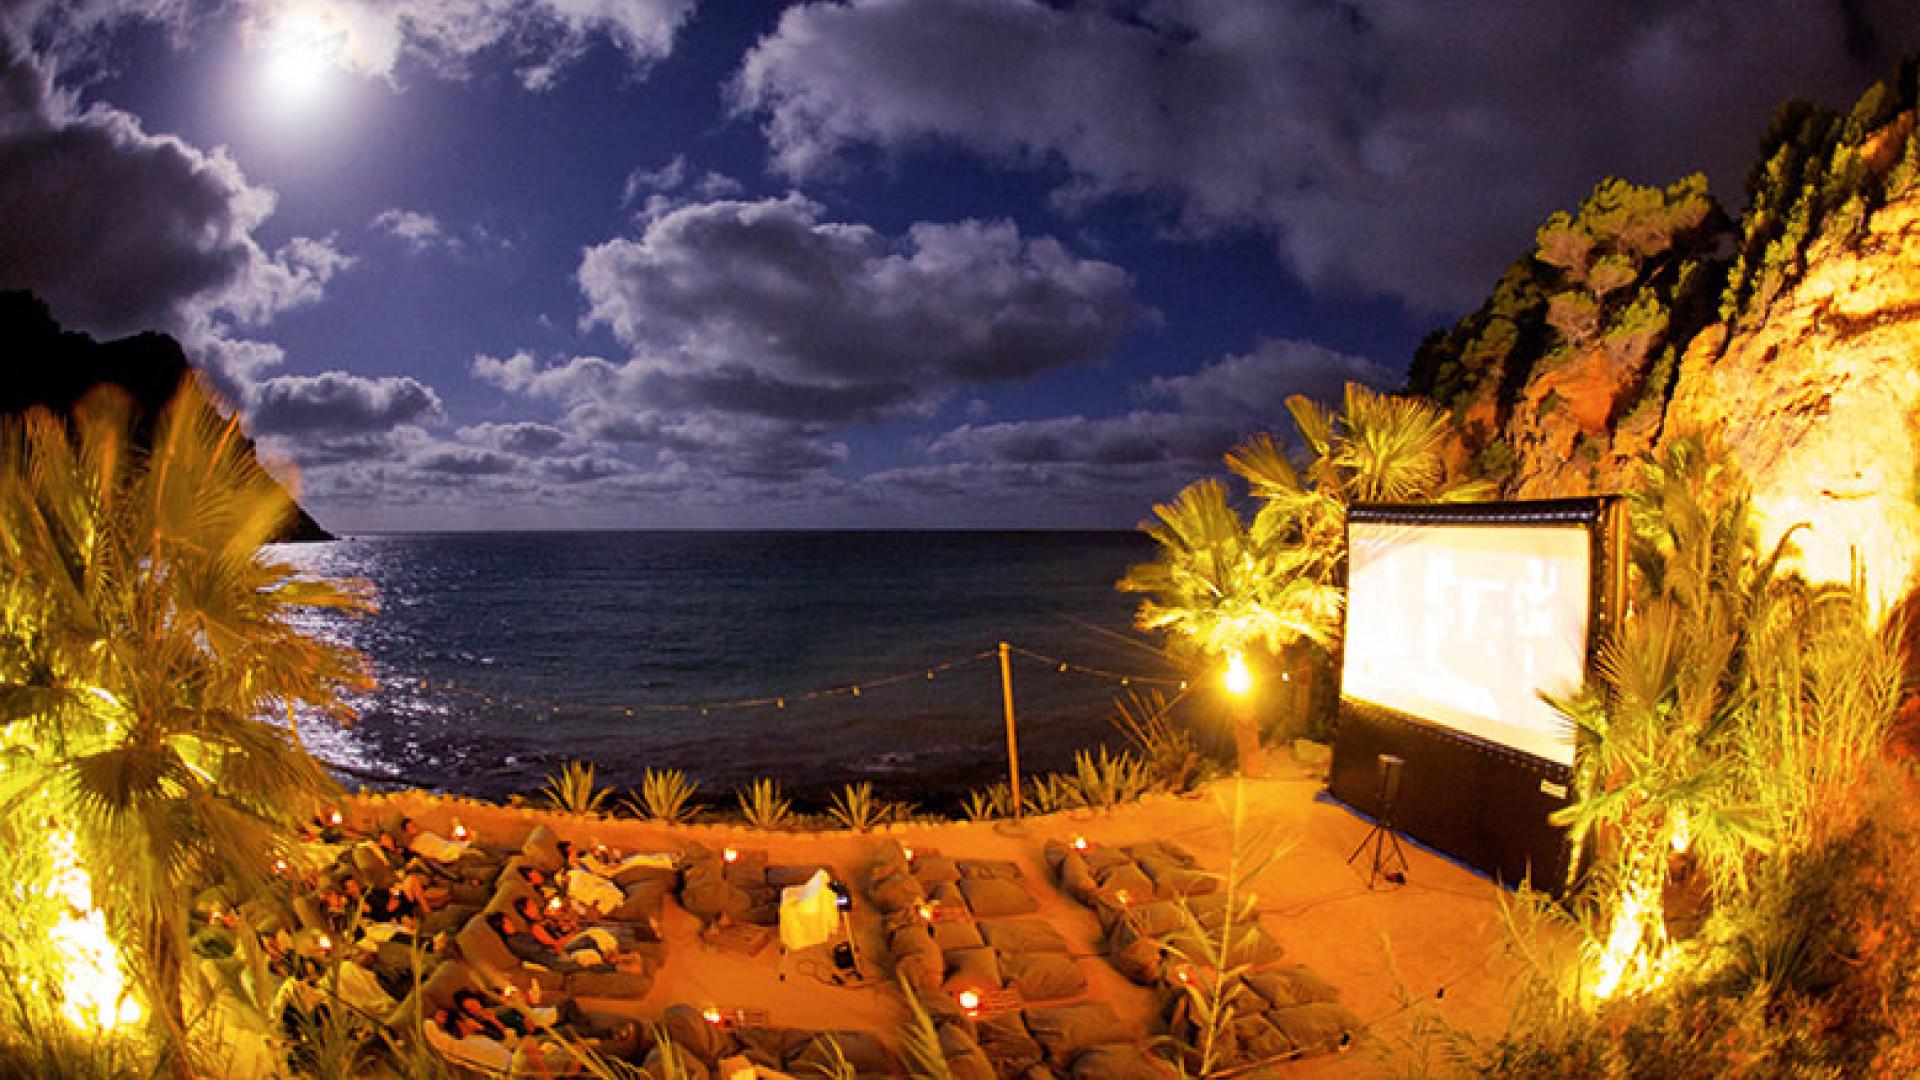 Amante-Movie-Night-_-Nic_Click_cmyk